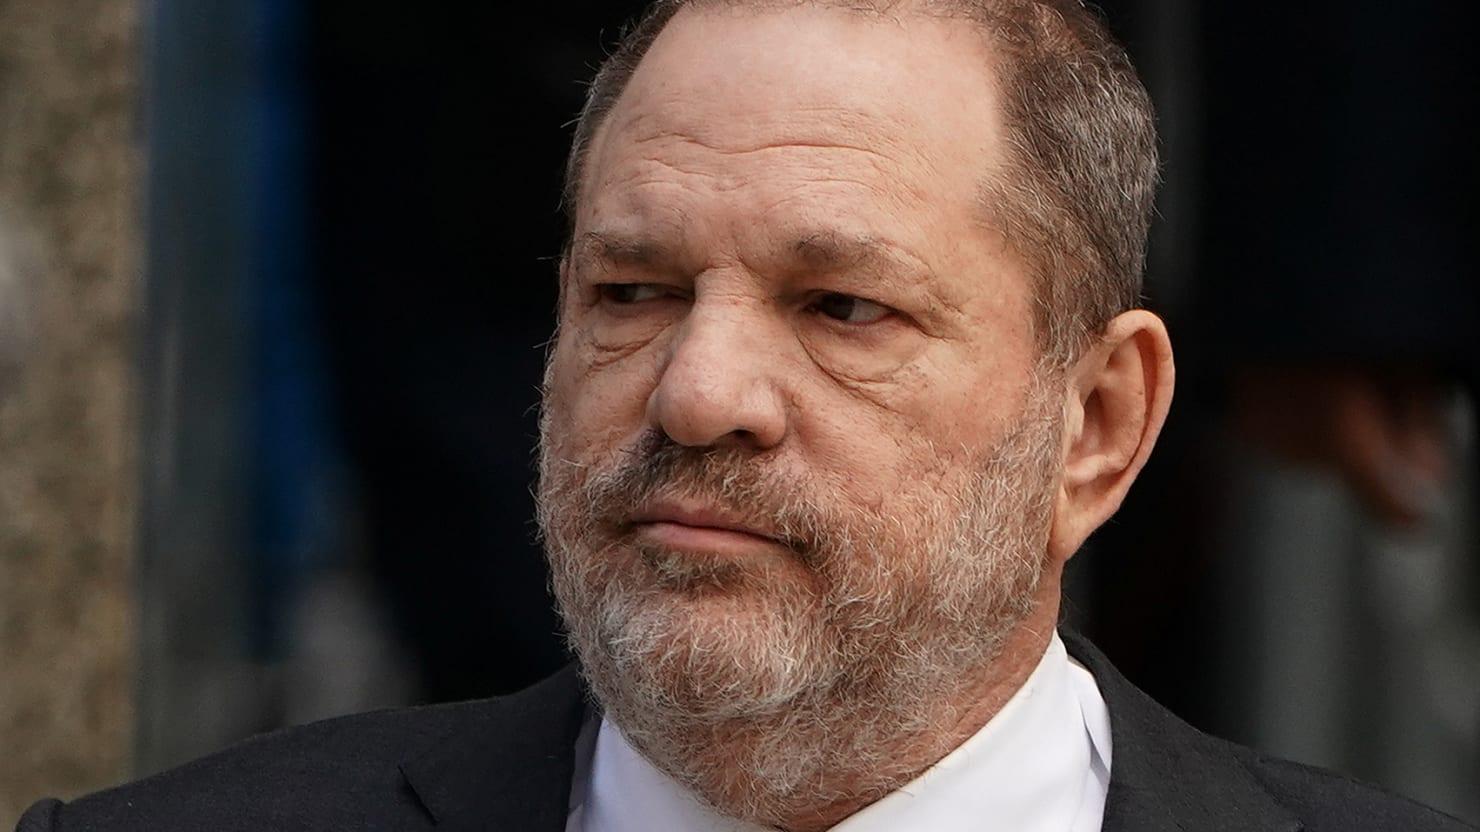 Judge Allows Sex-Trafficking Claim in Lawsuit Against Harvey Weinstein